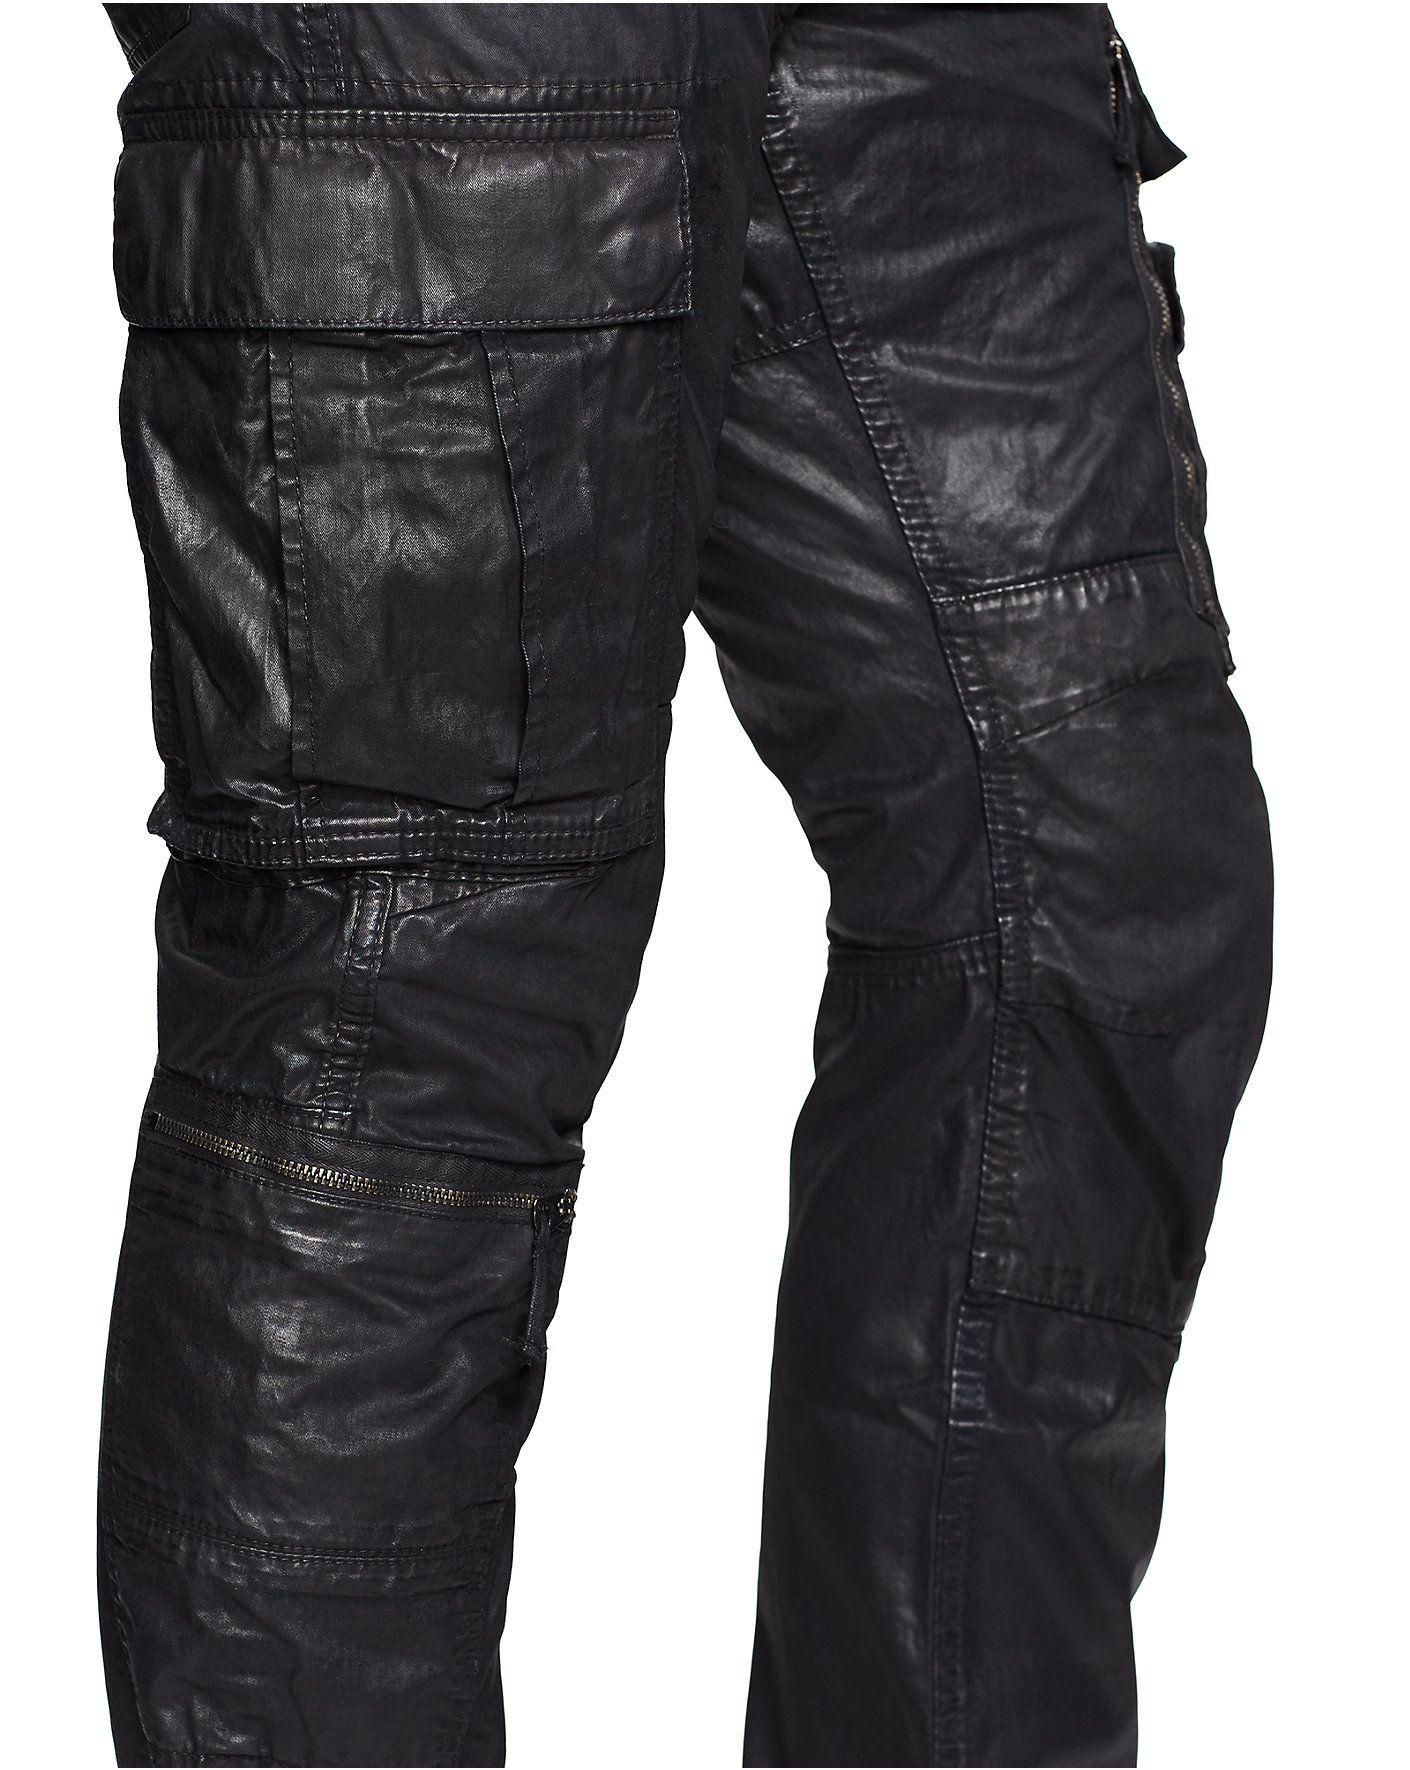 Coated Military Pant